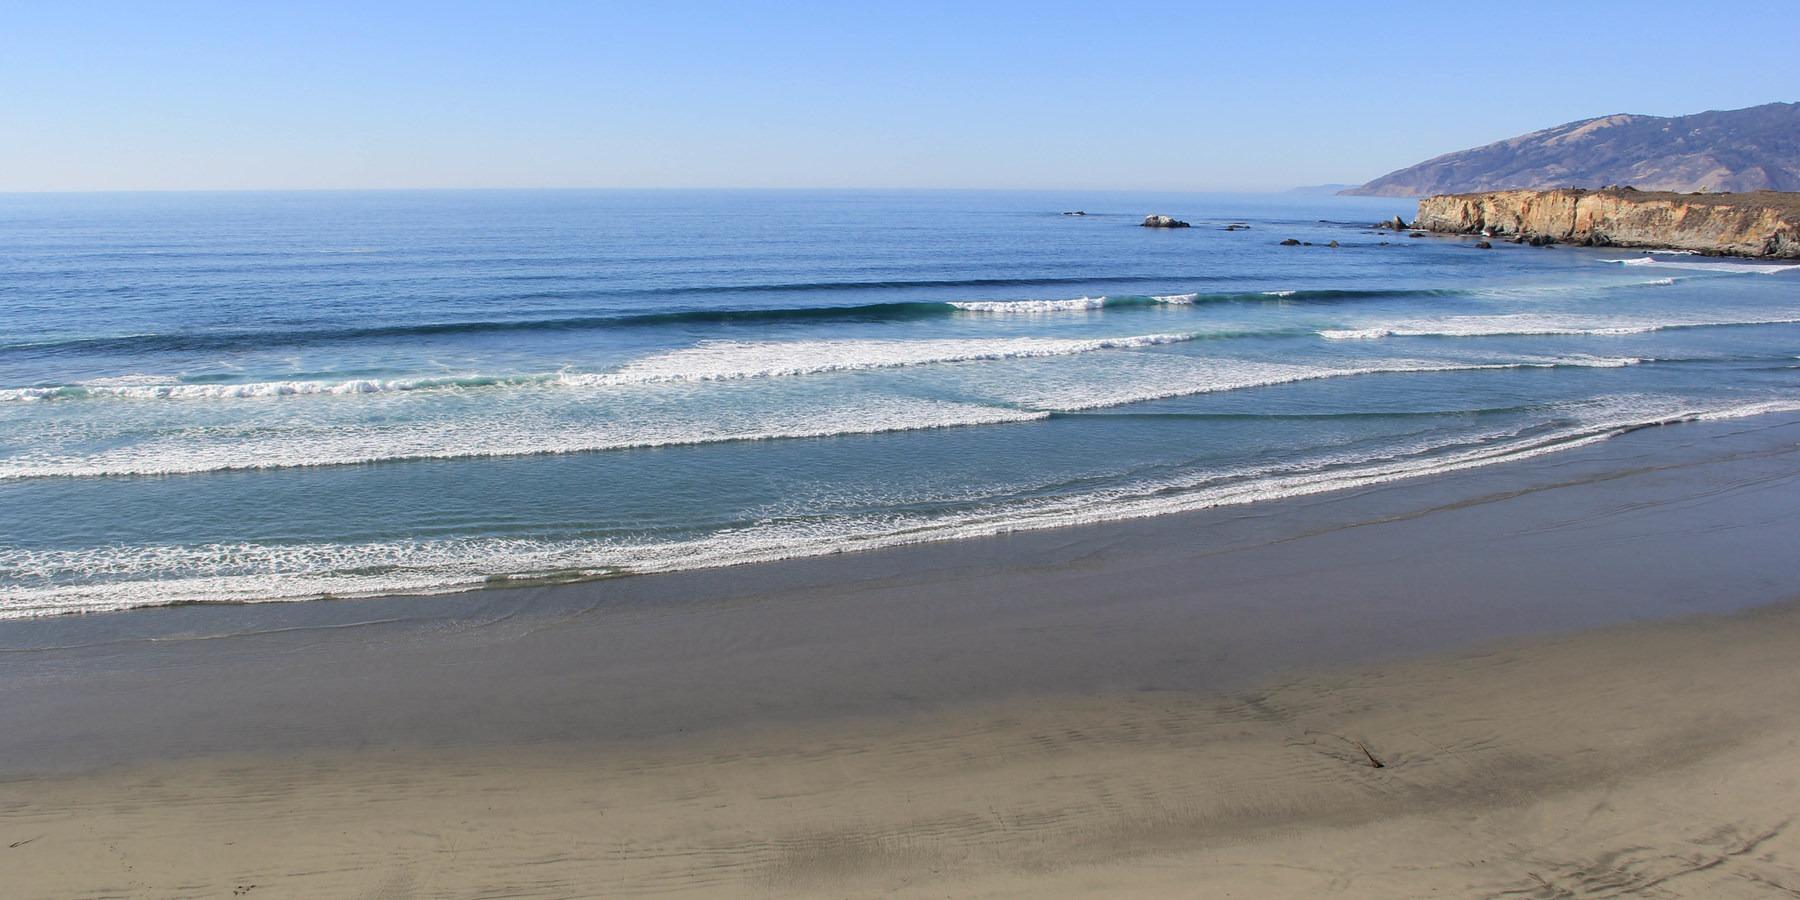 A Clean Swell Wraps In At Sand Dollar Beach Best West Coast Beaches For Surfing Pleasure Point Near Santa Cruz